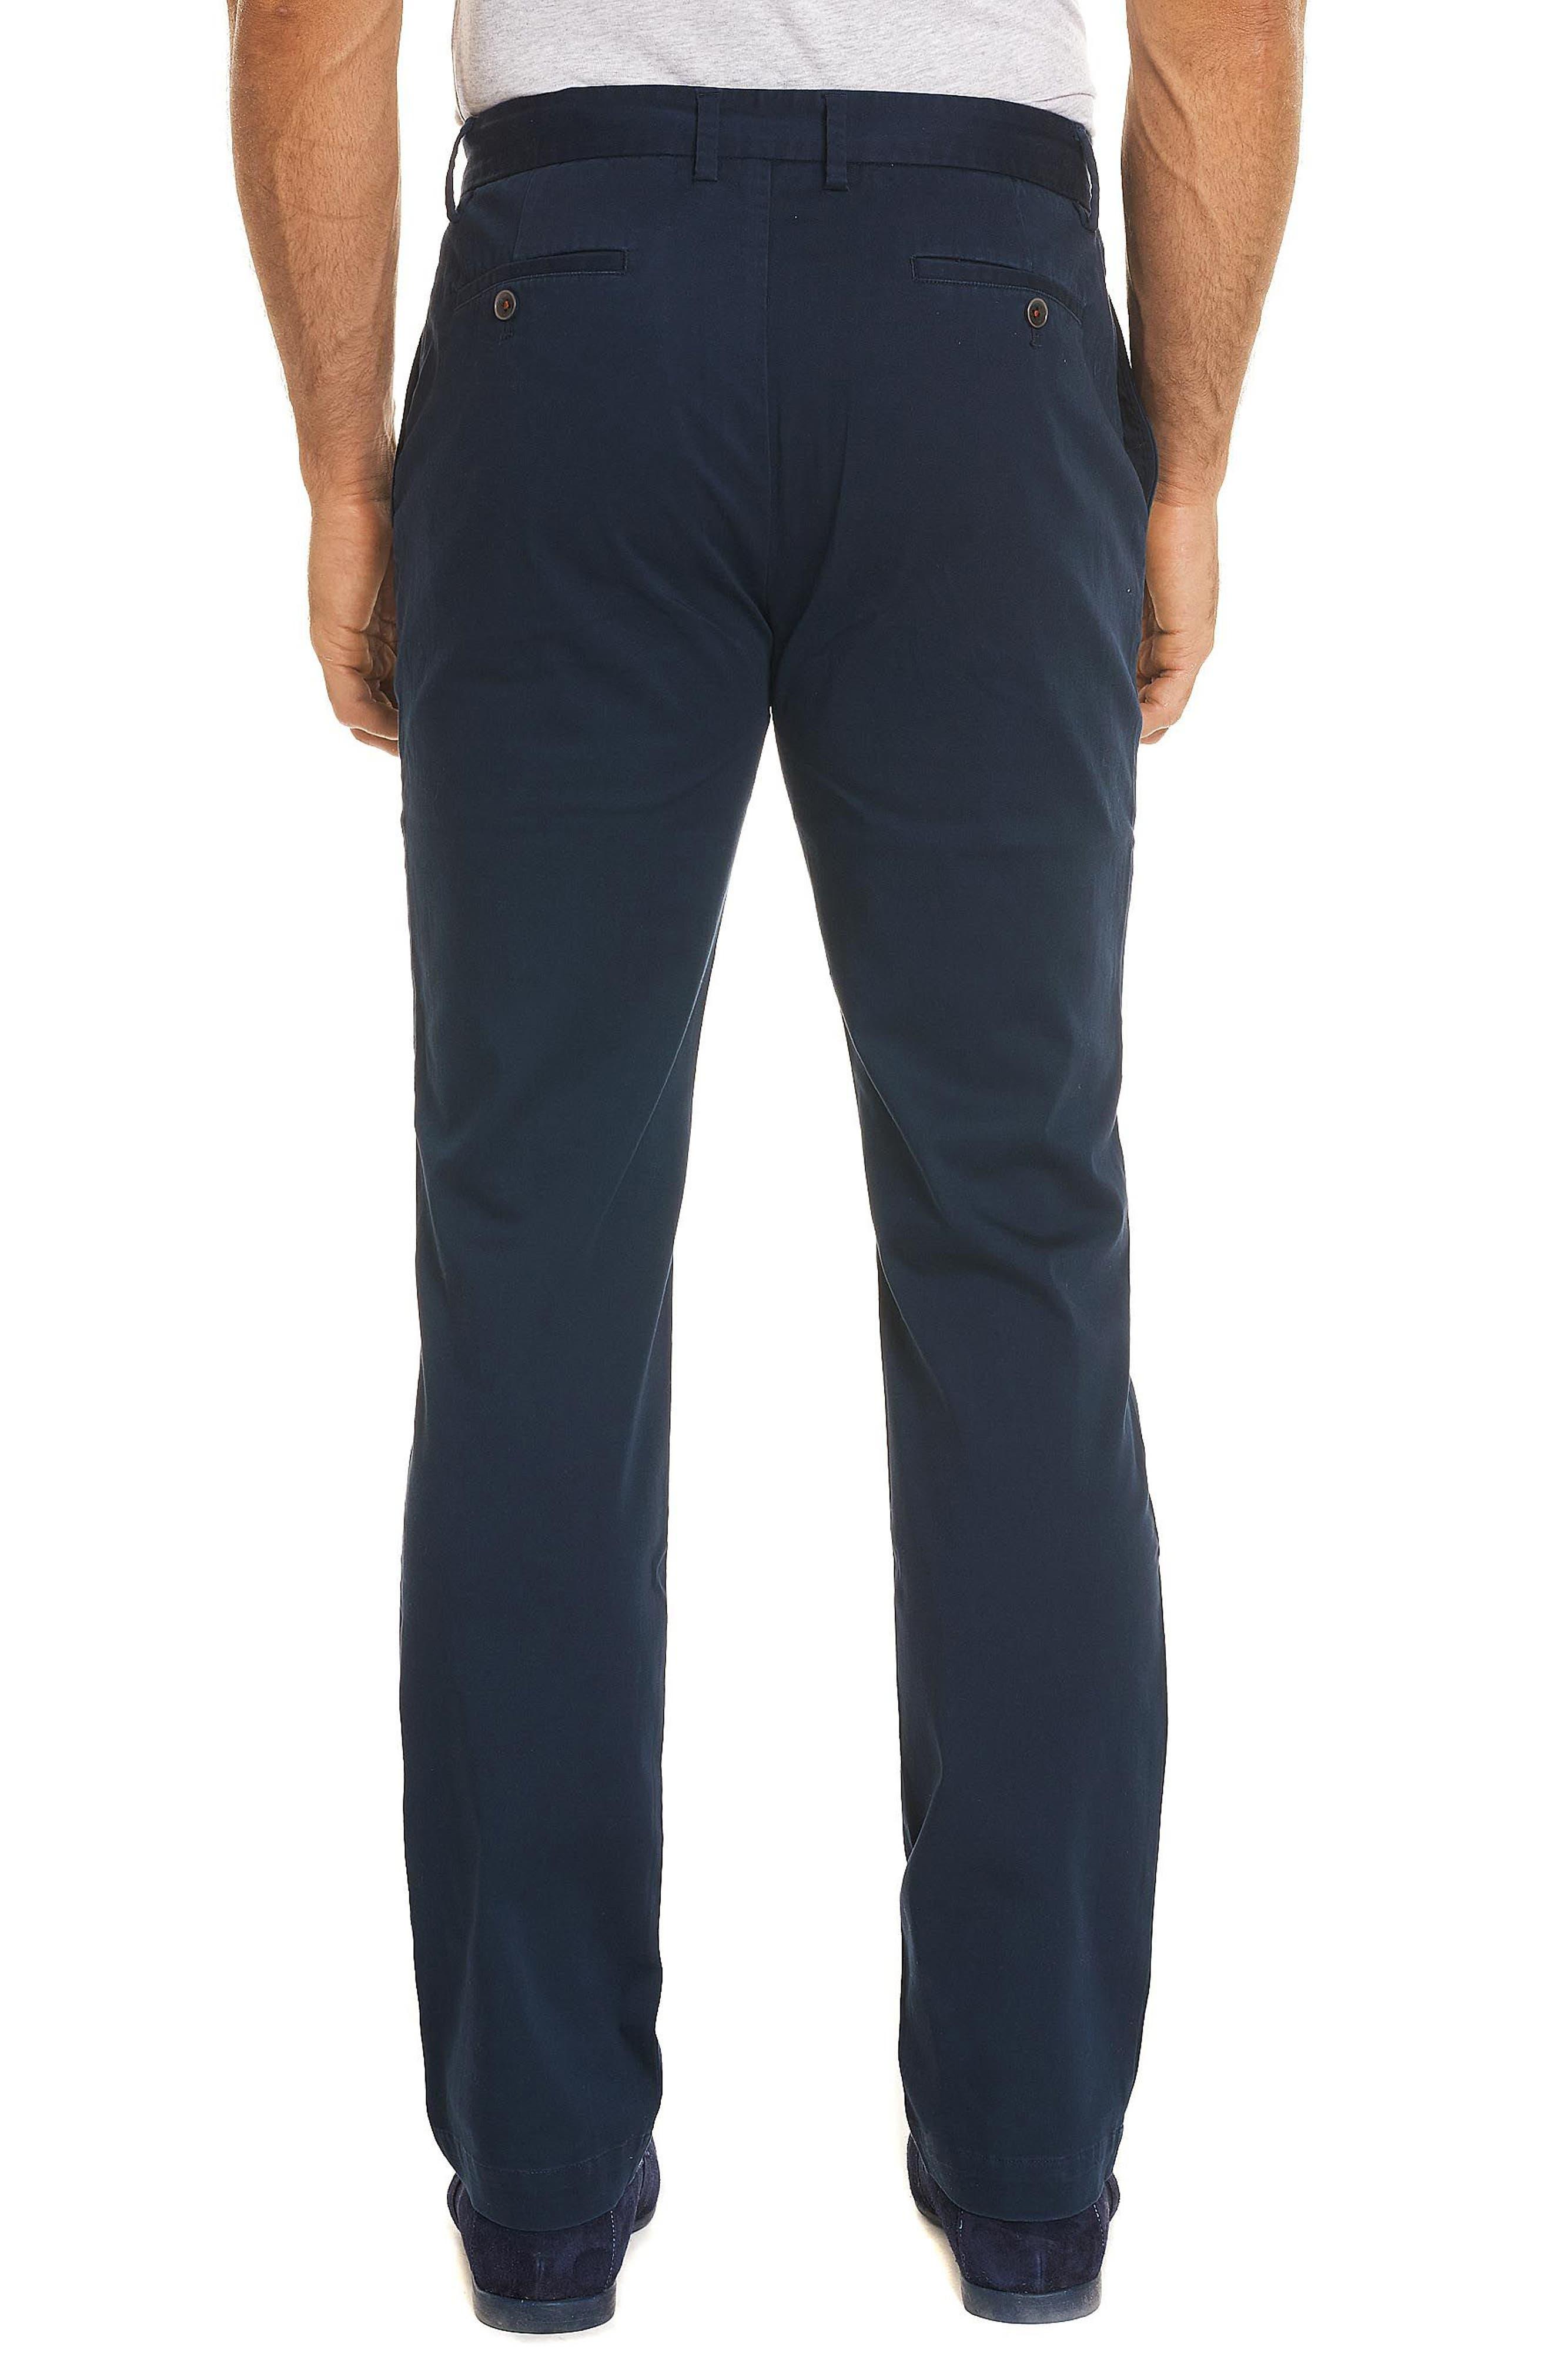 Burton Tailored Fit Pants,                             Alternate thumbnail 2, color,                             410